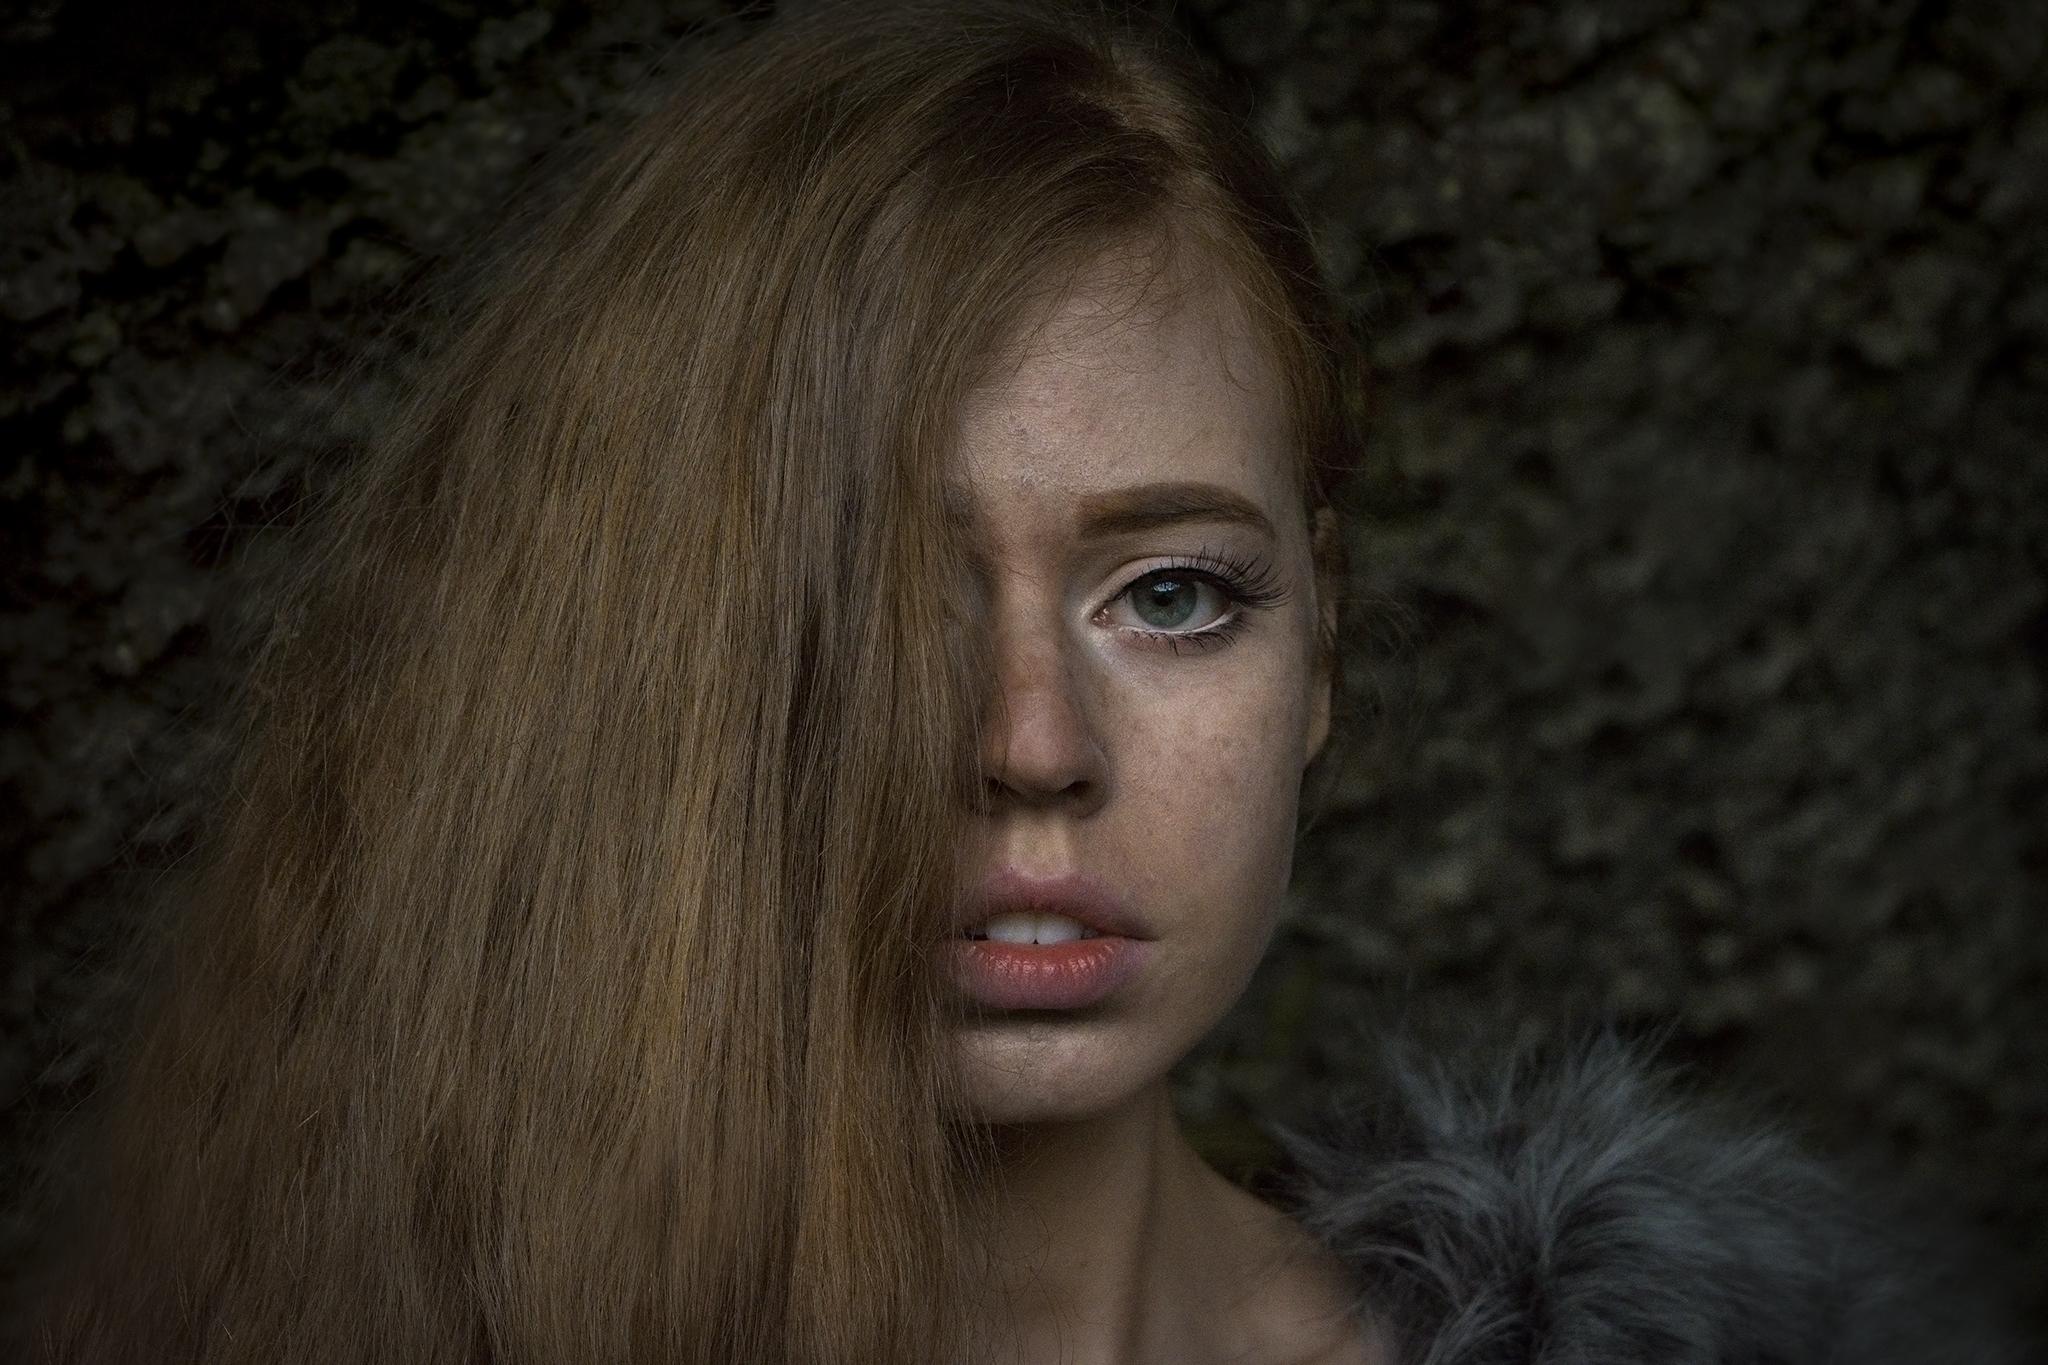 Portrait of an Icelandic girl